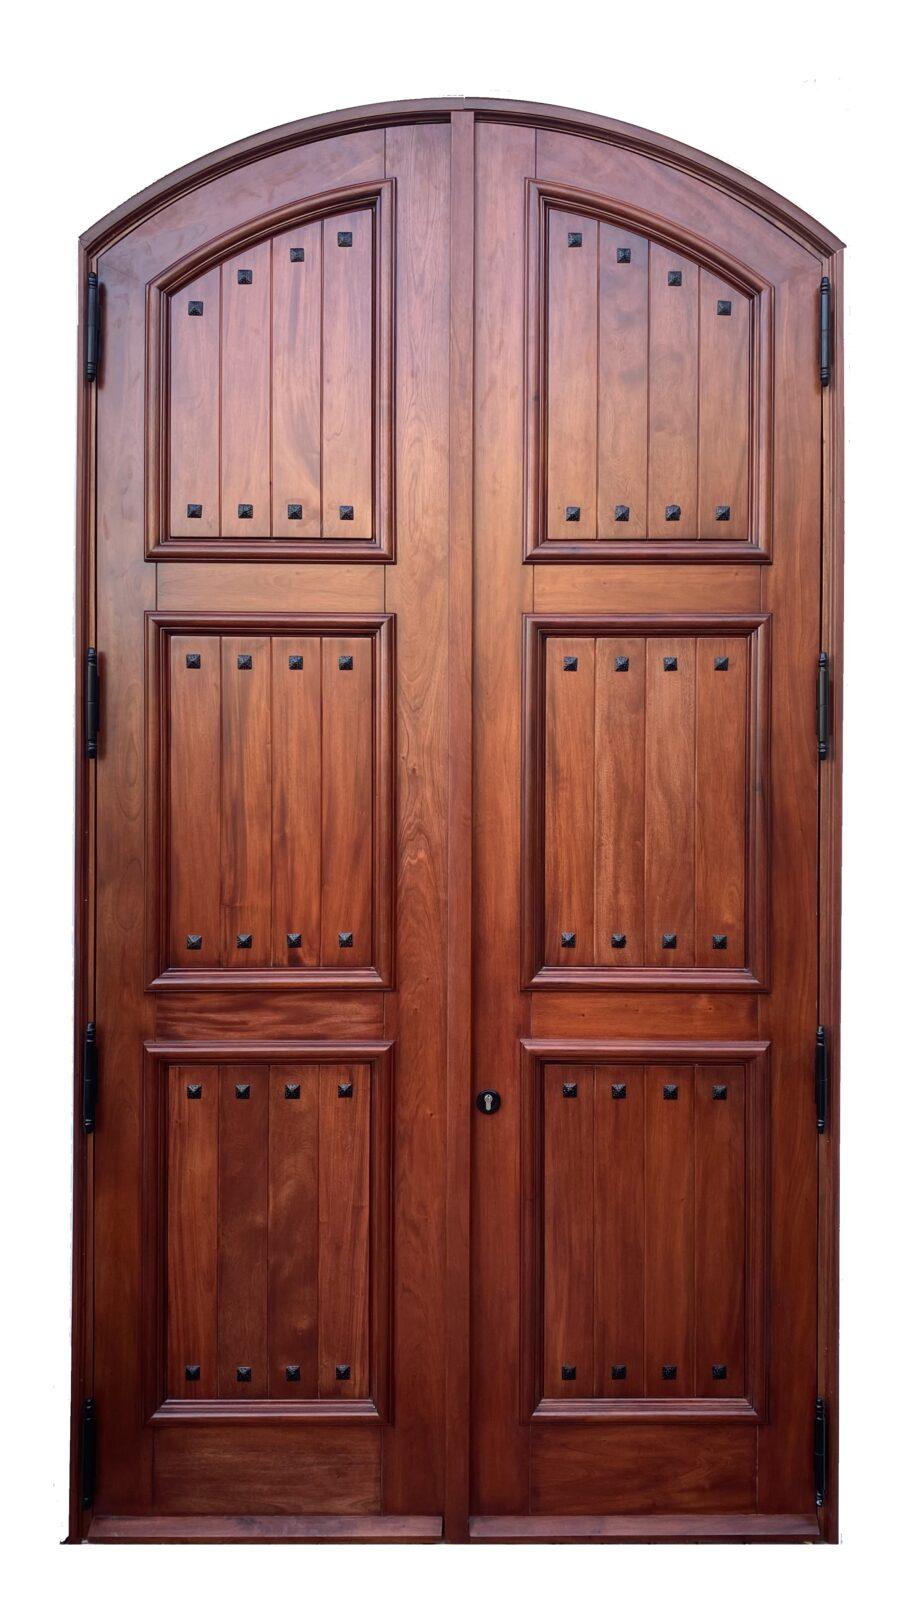 IBRAHIM MAHOGANY GATE ENTRY DOOR